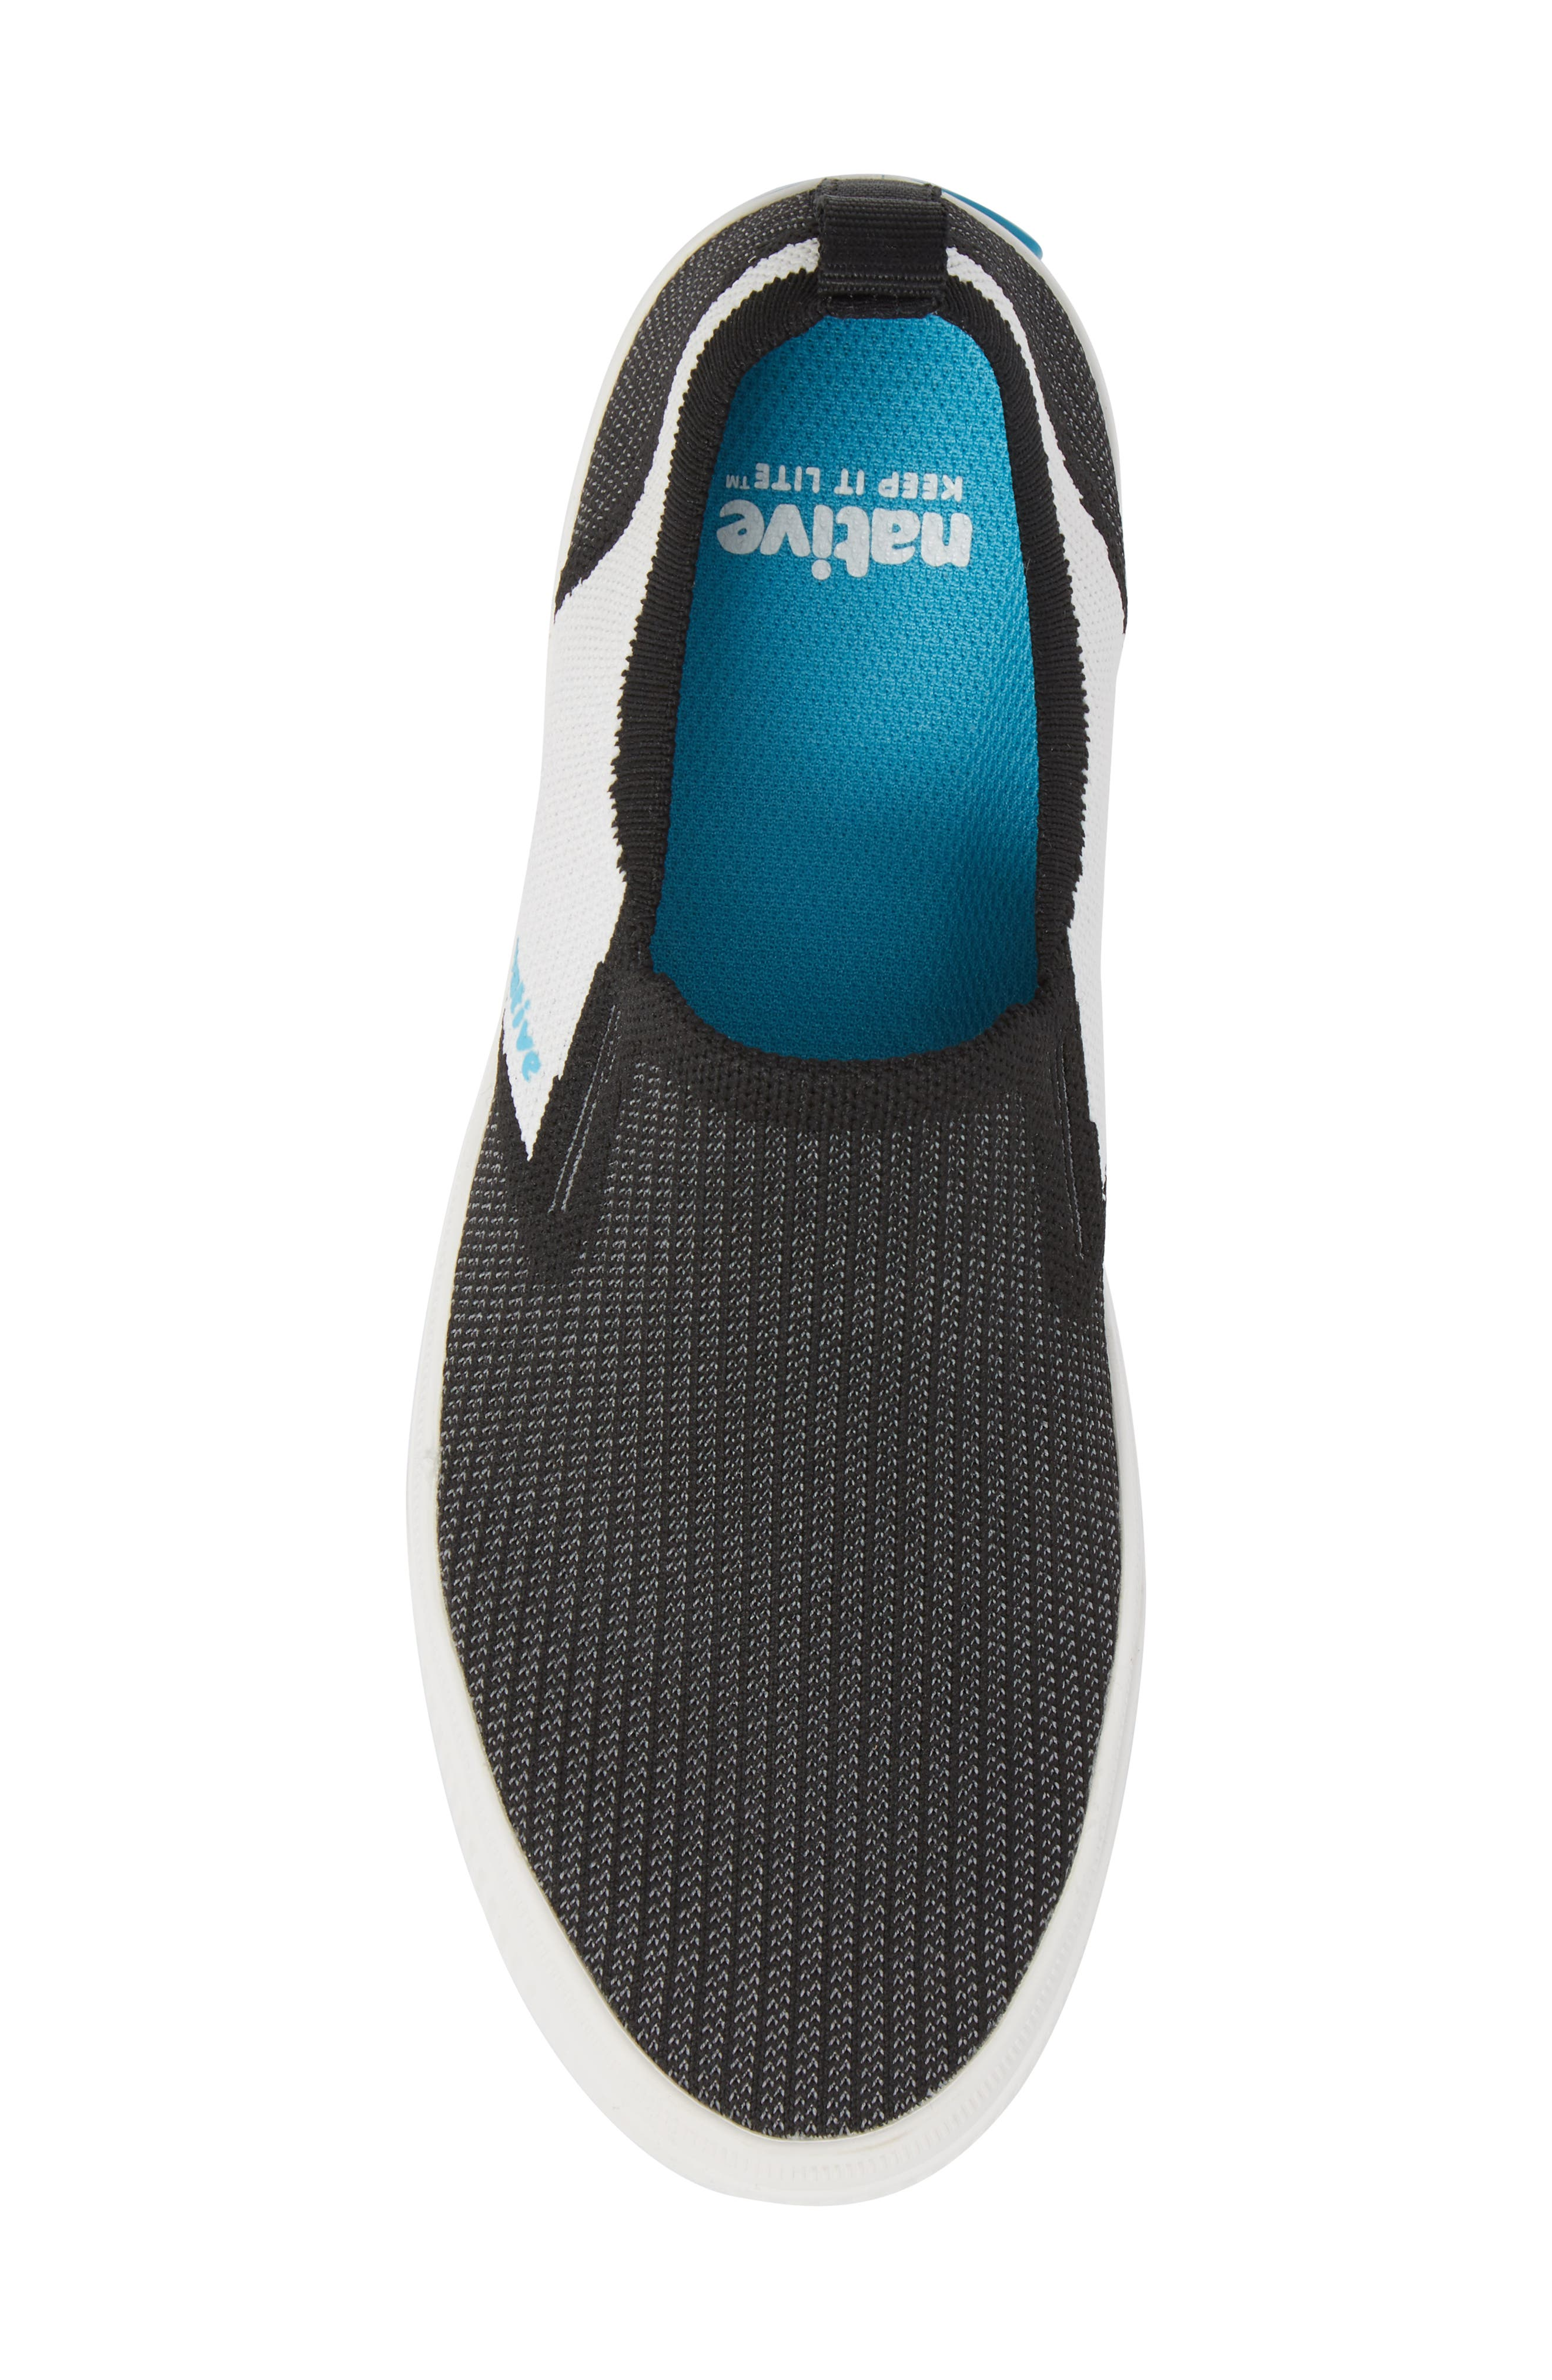 Miles Liteknit Slip-On Sneaker,                             Alternate thumbnail 5, color,                             JIFFY BLACK/ SHELL WHITE